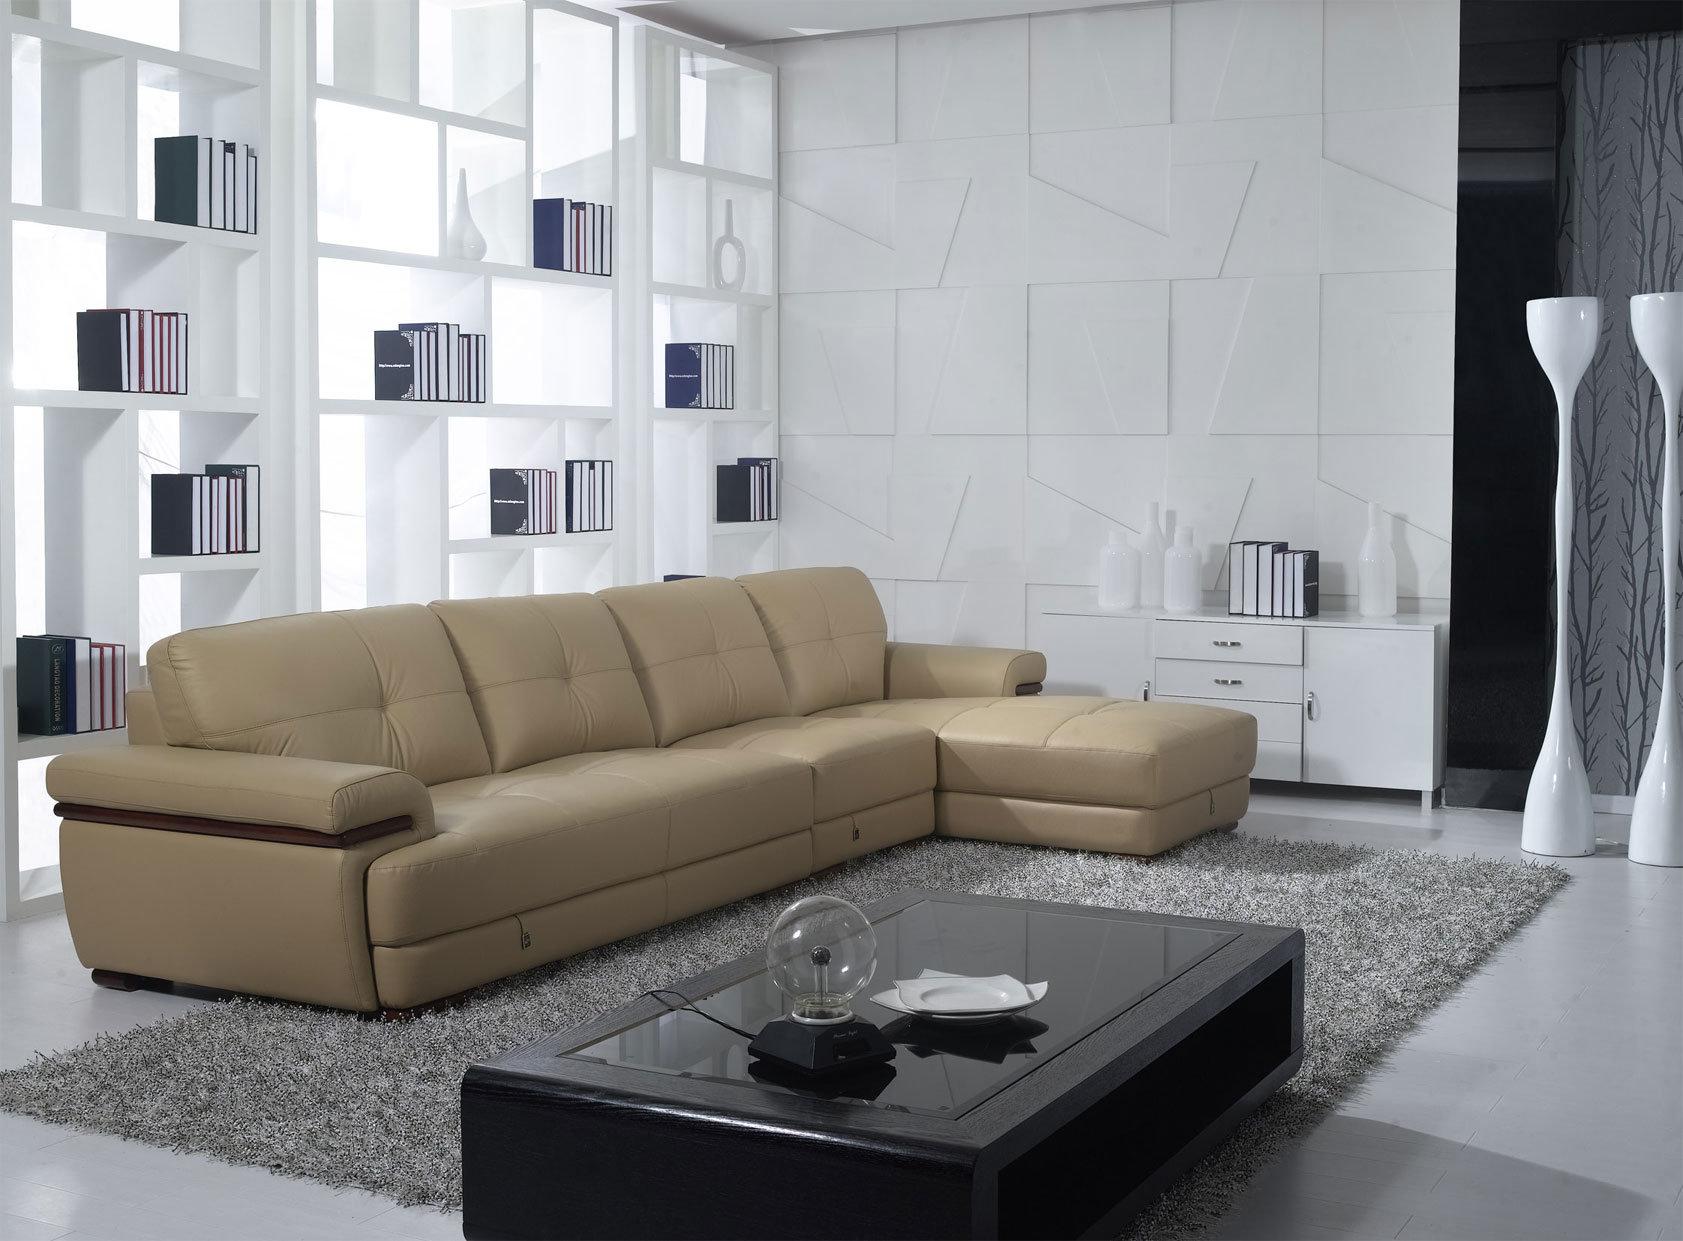 China High Quality Leather Sofa